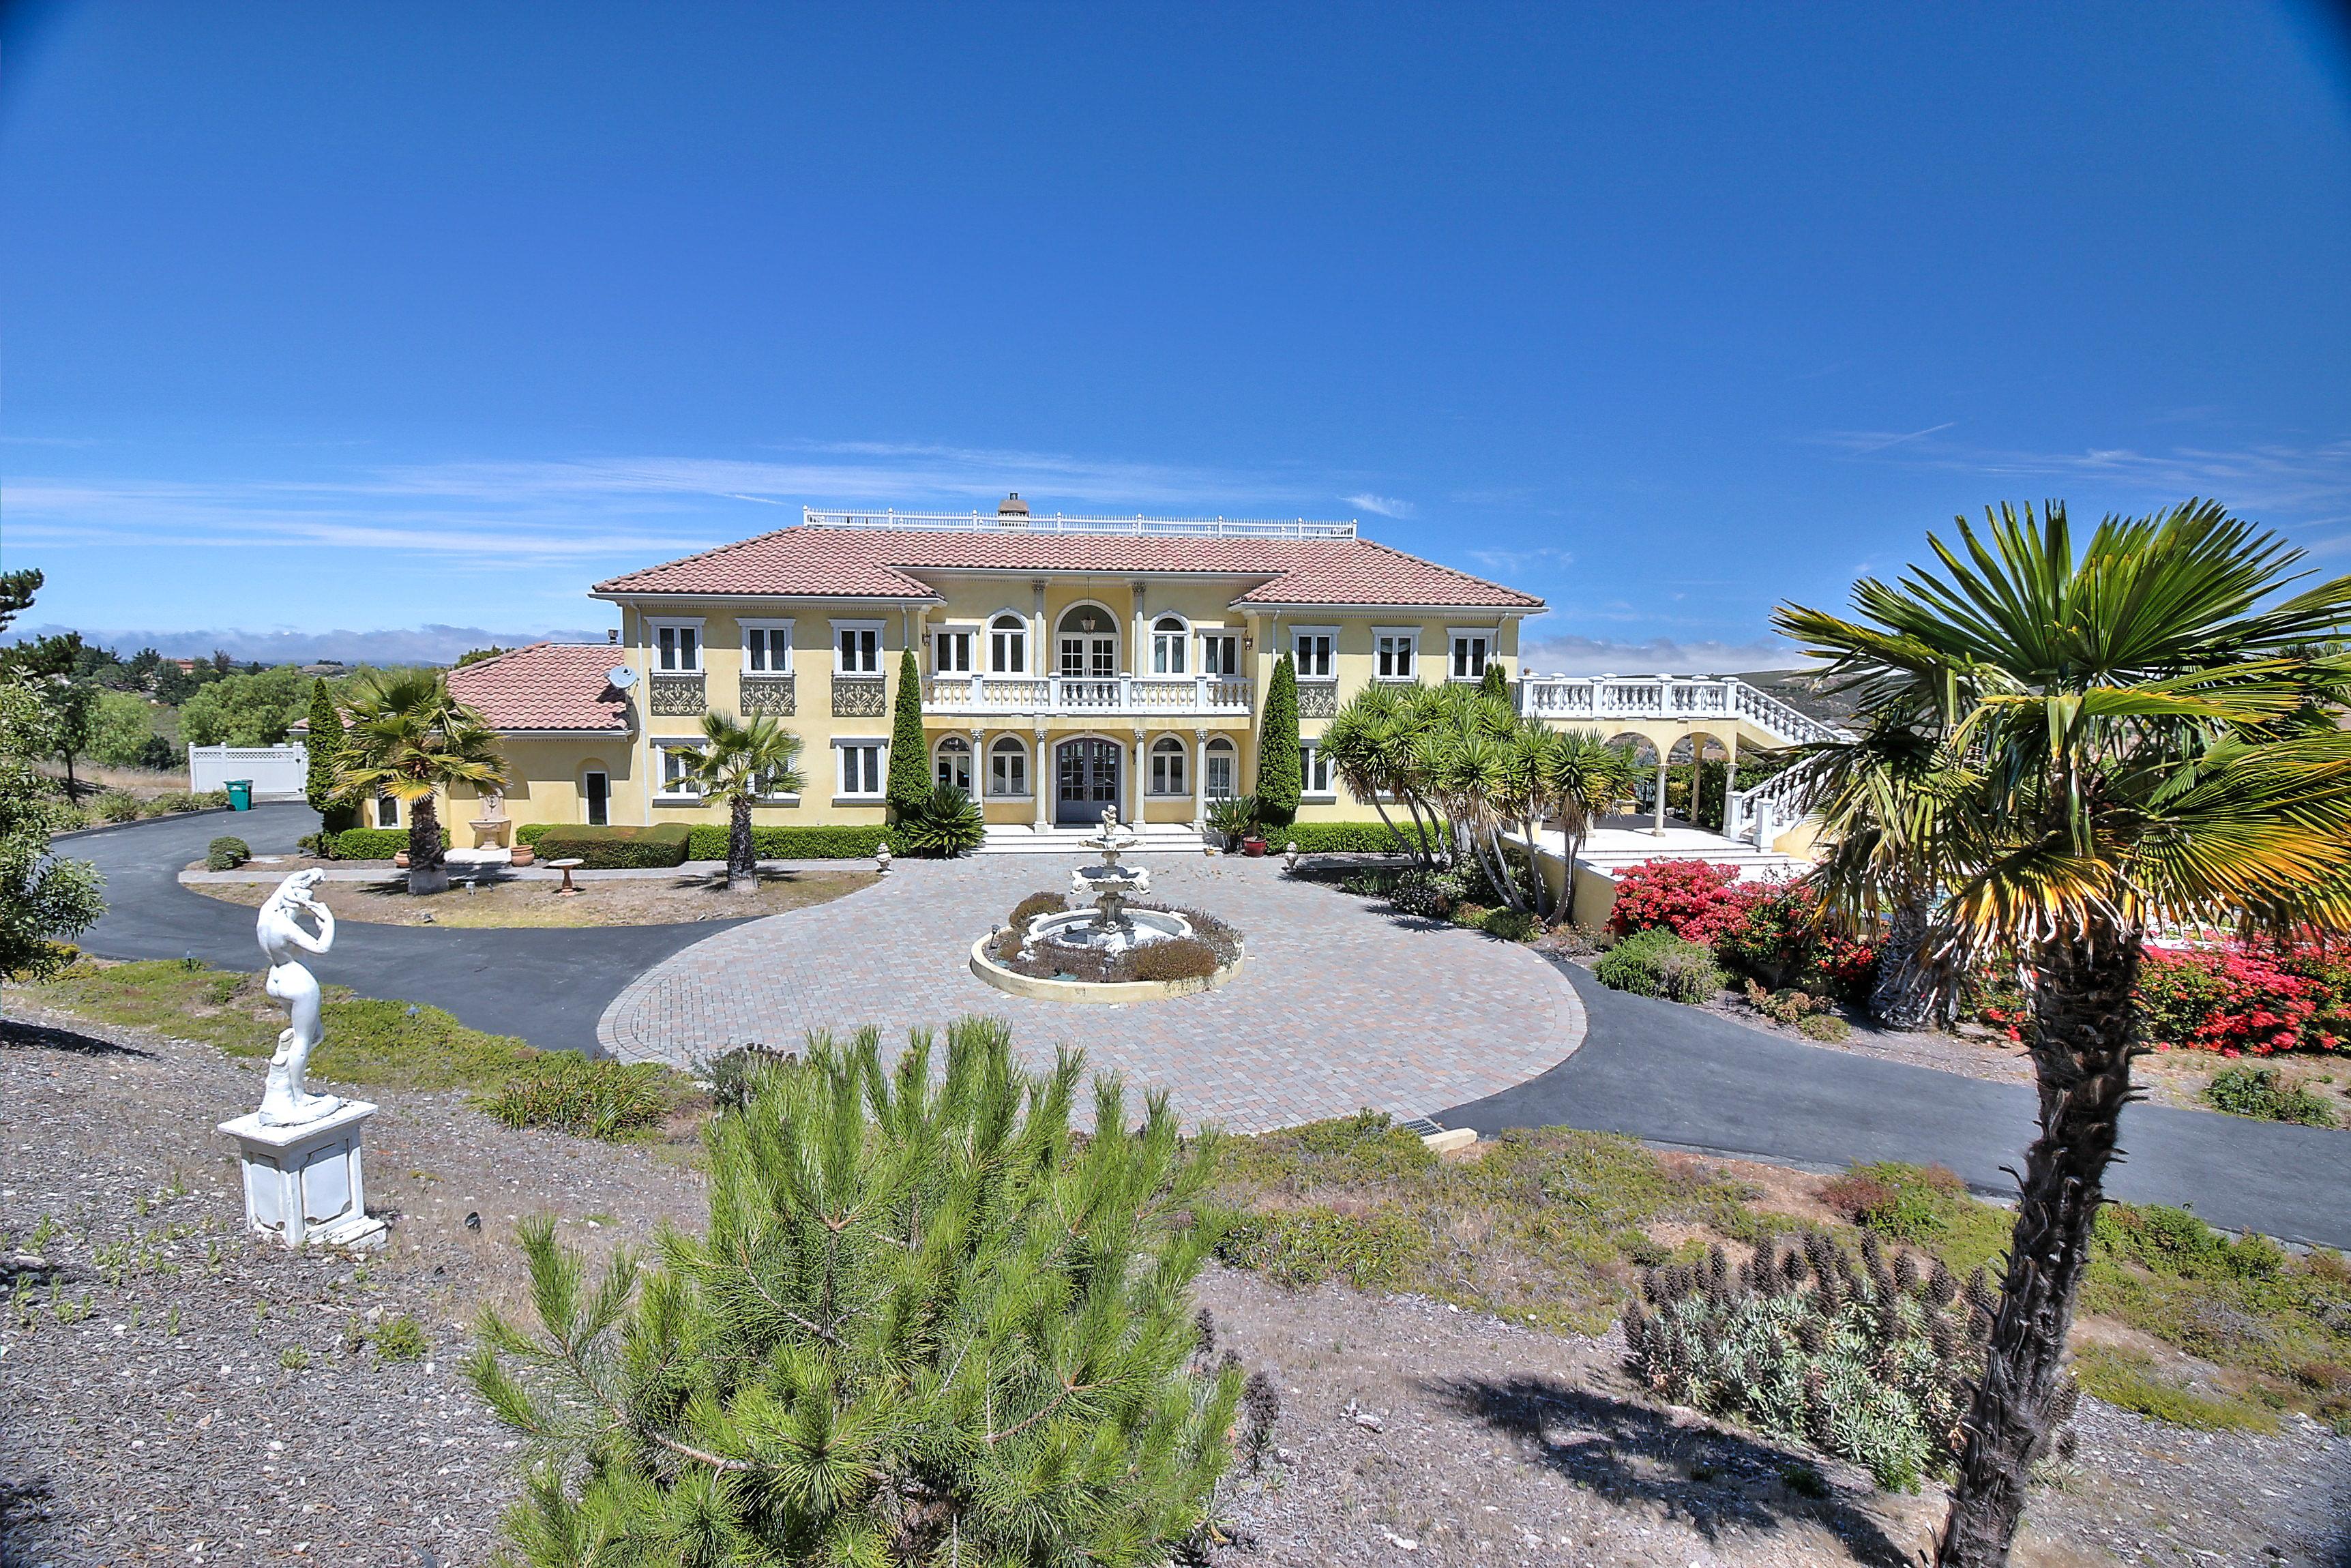 11560 Spur Rd., Monterey, CA 93950 exterior